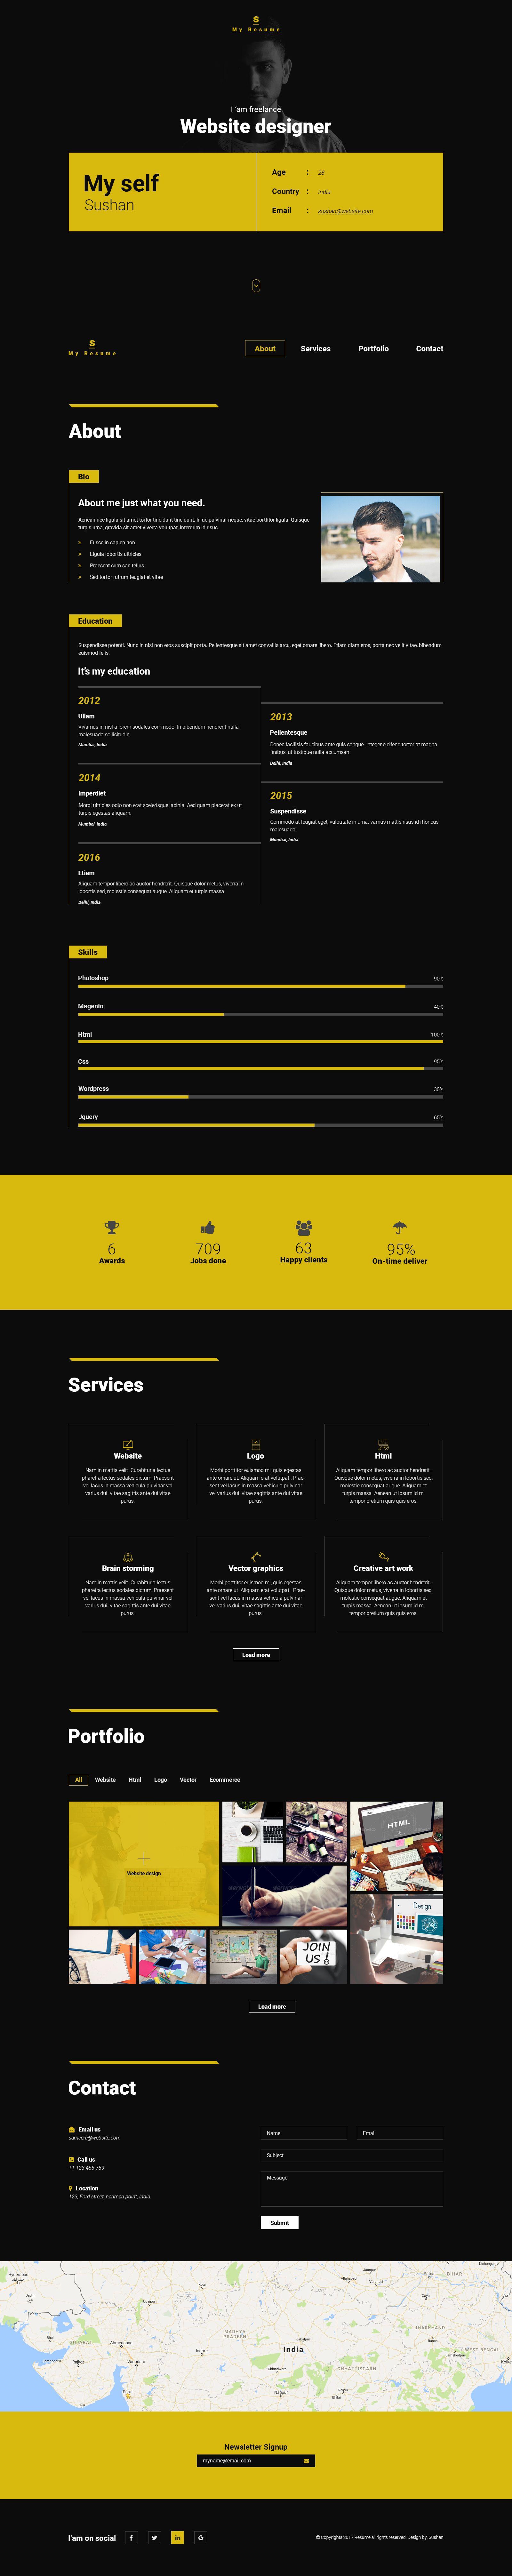 S Resume, Cv, Portfolio One Page PSD Template Psd